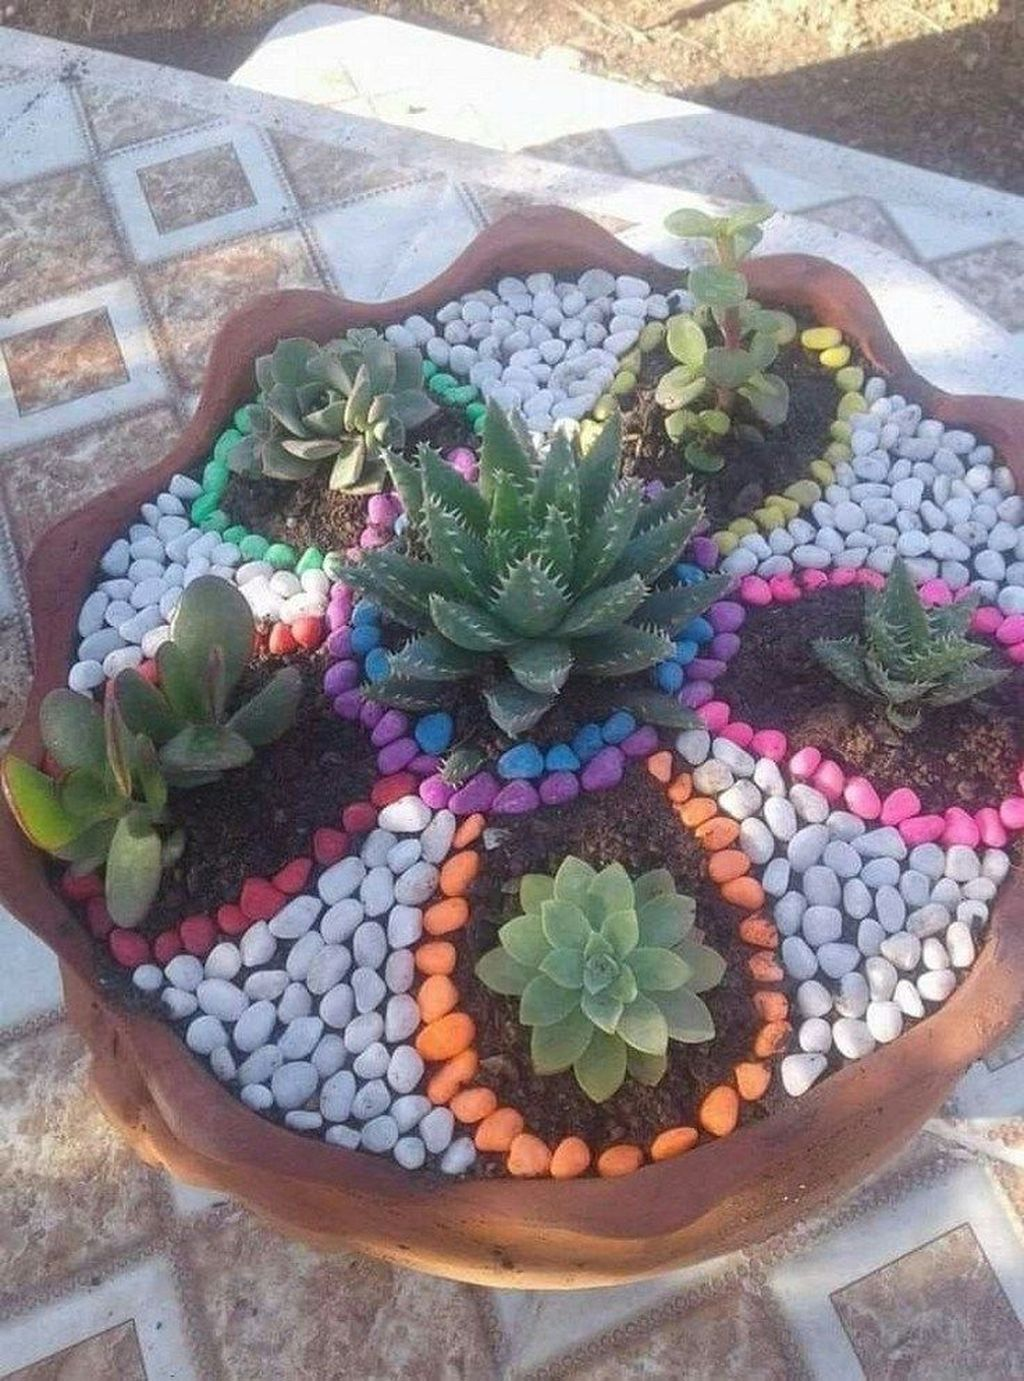 Incredible Cactus Garden Landscaping Ideas Best For Summer 13